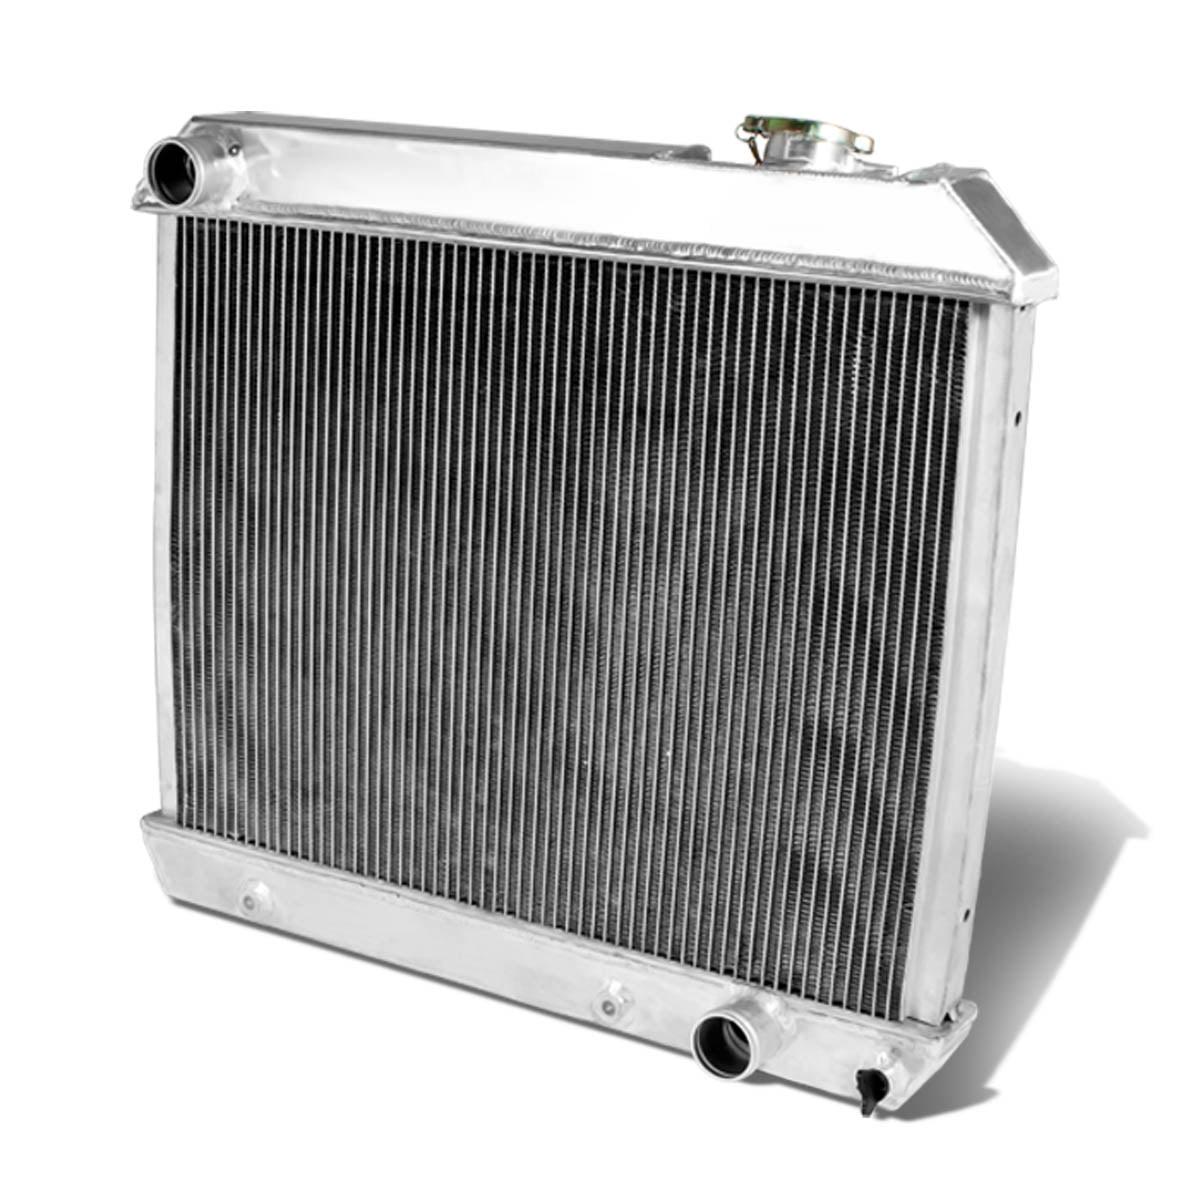 For 63-66 Chevy C/K Pickup Full Aluminum 3-Row Racing Radiator - 1 Gen 64 65